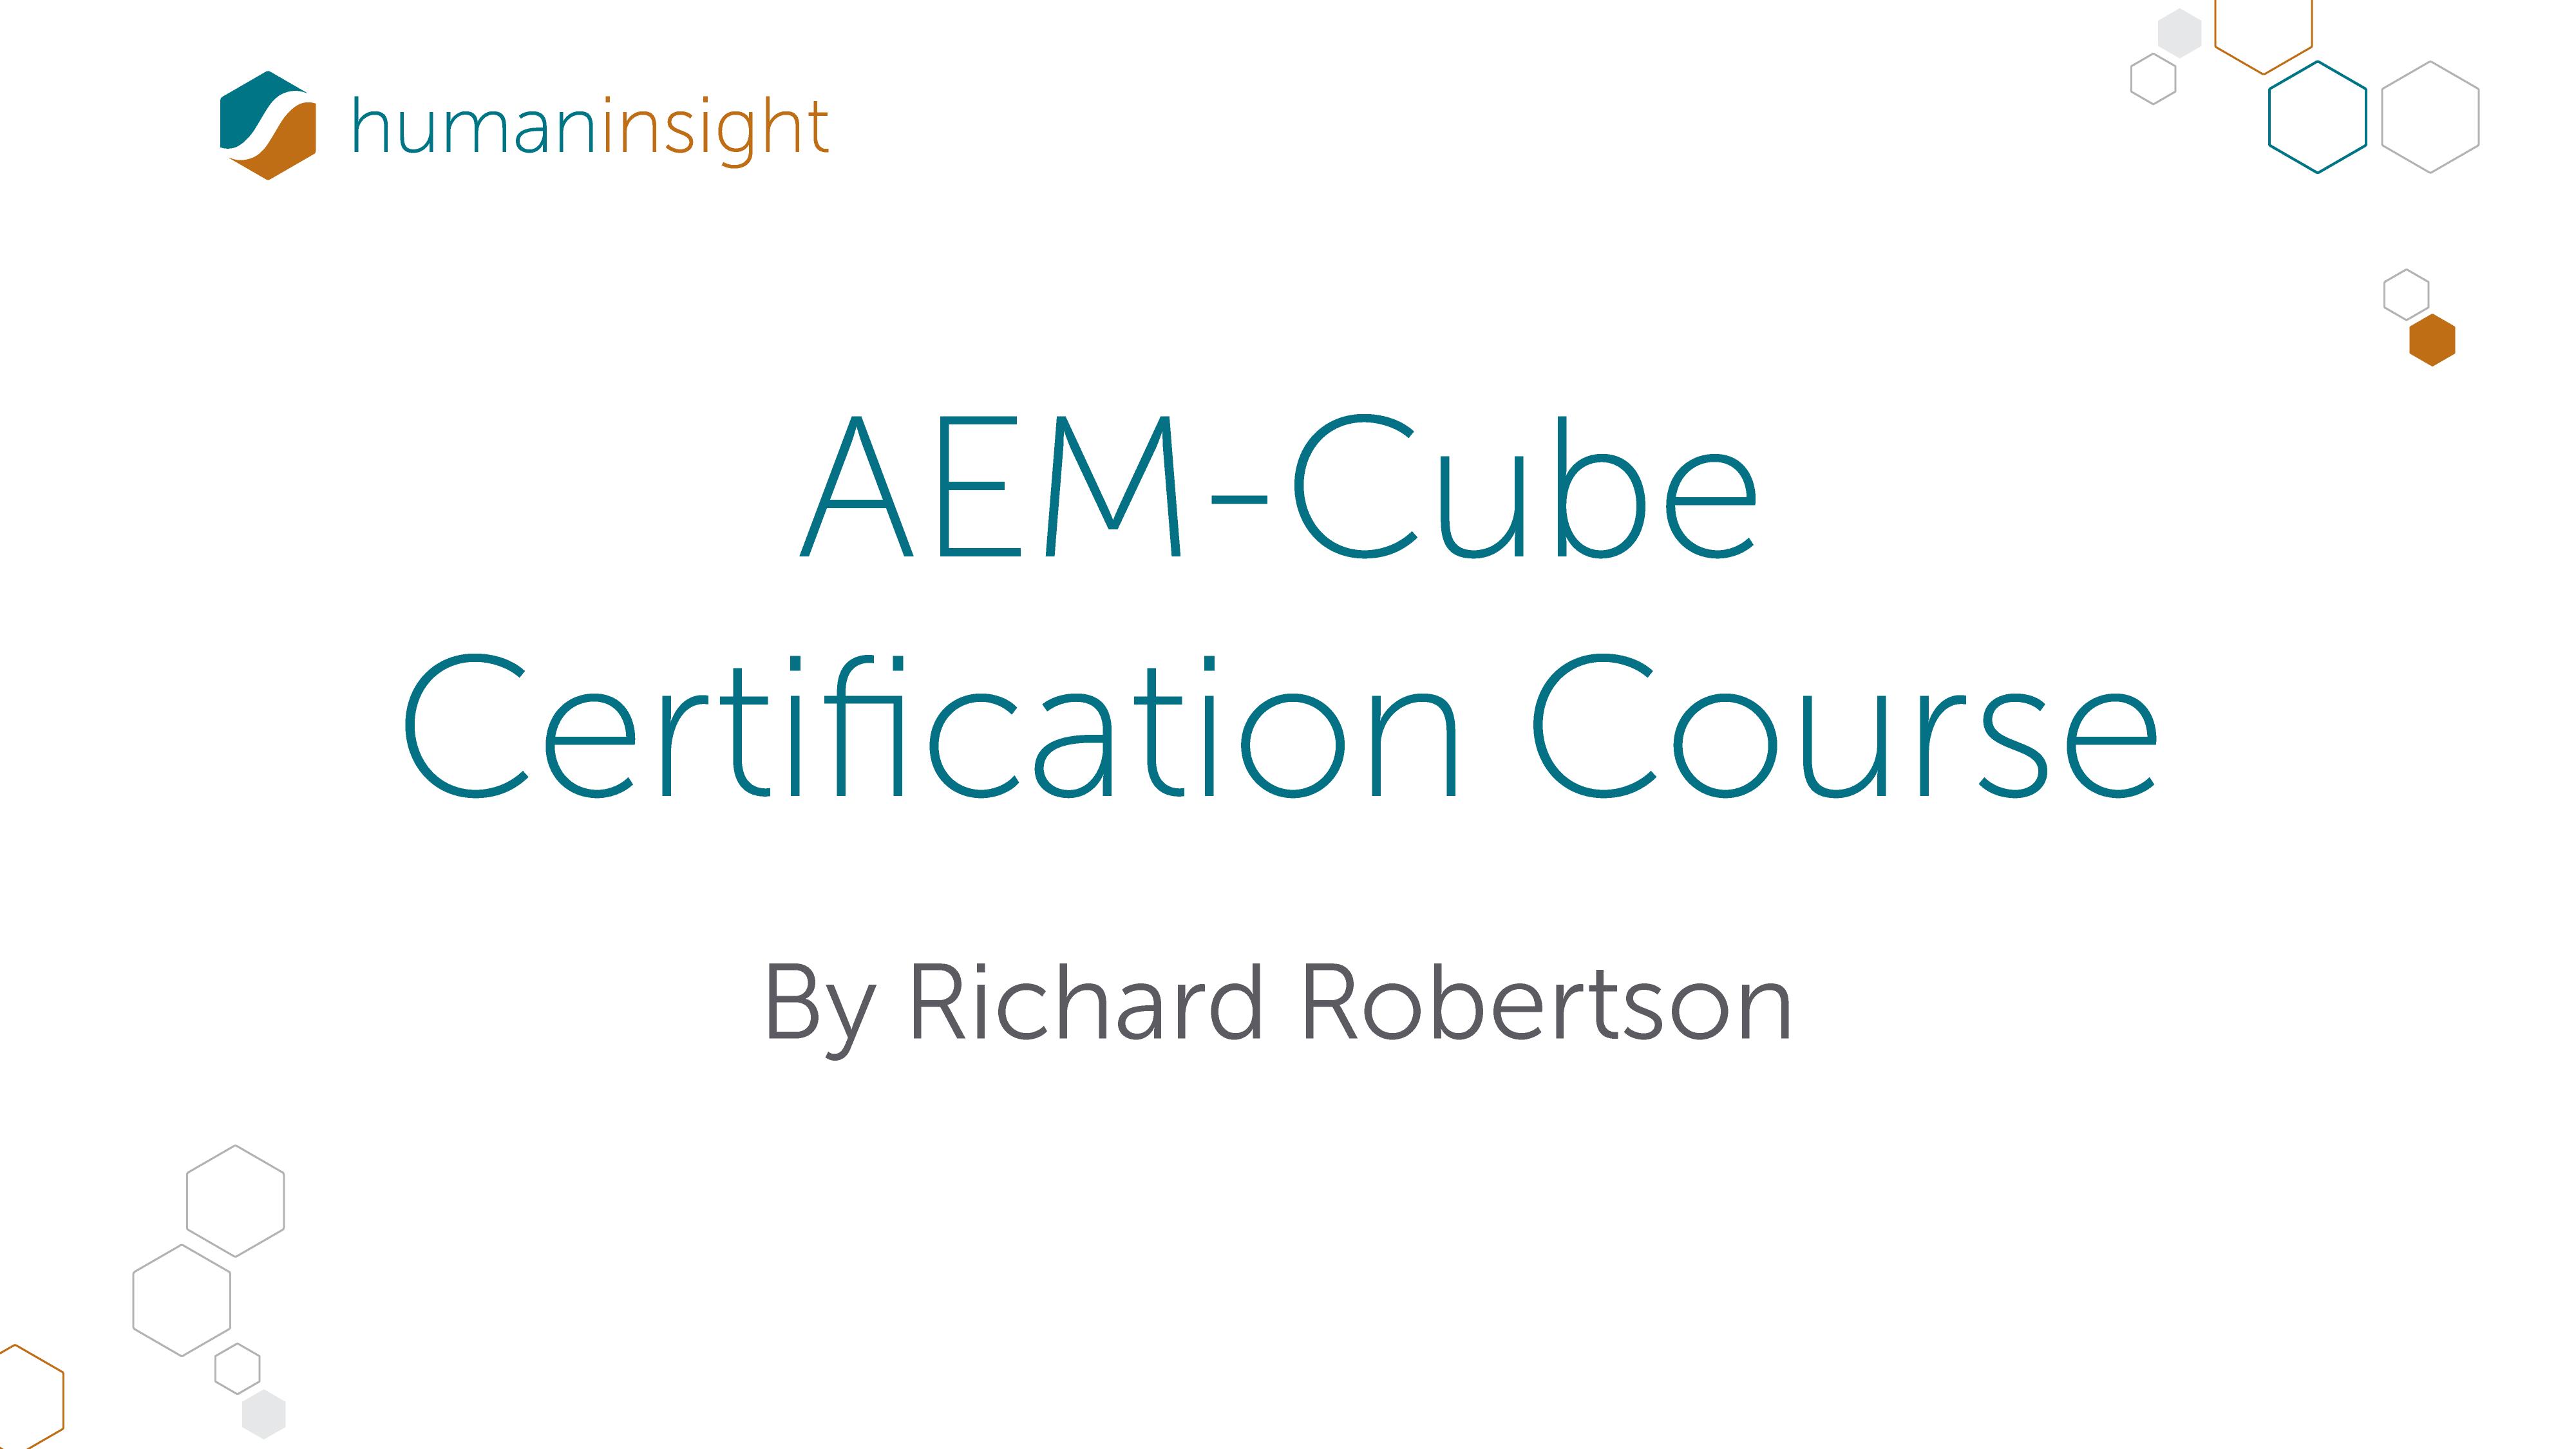 Certification Training Part 44 The Aem Cube Human Insight Academy